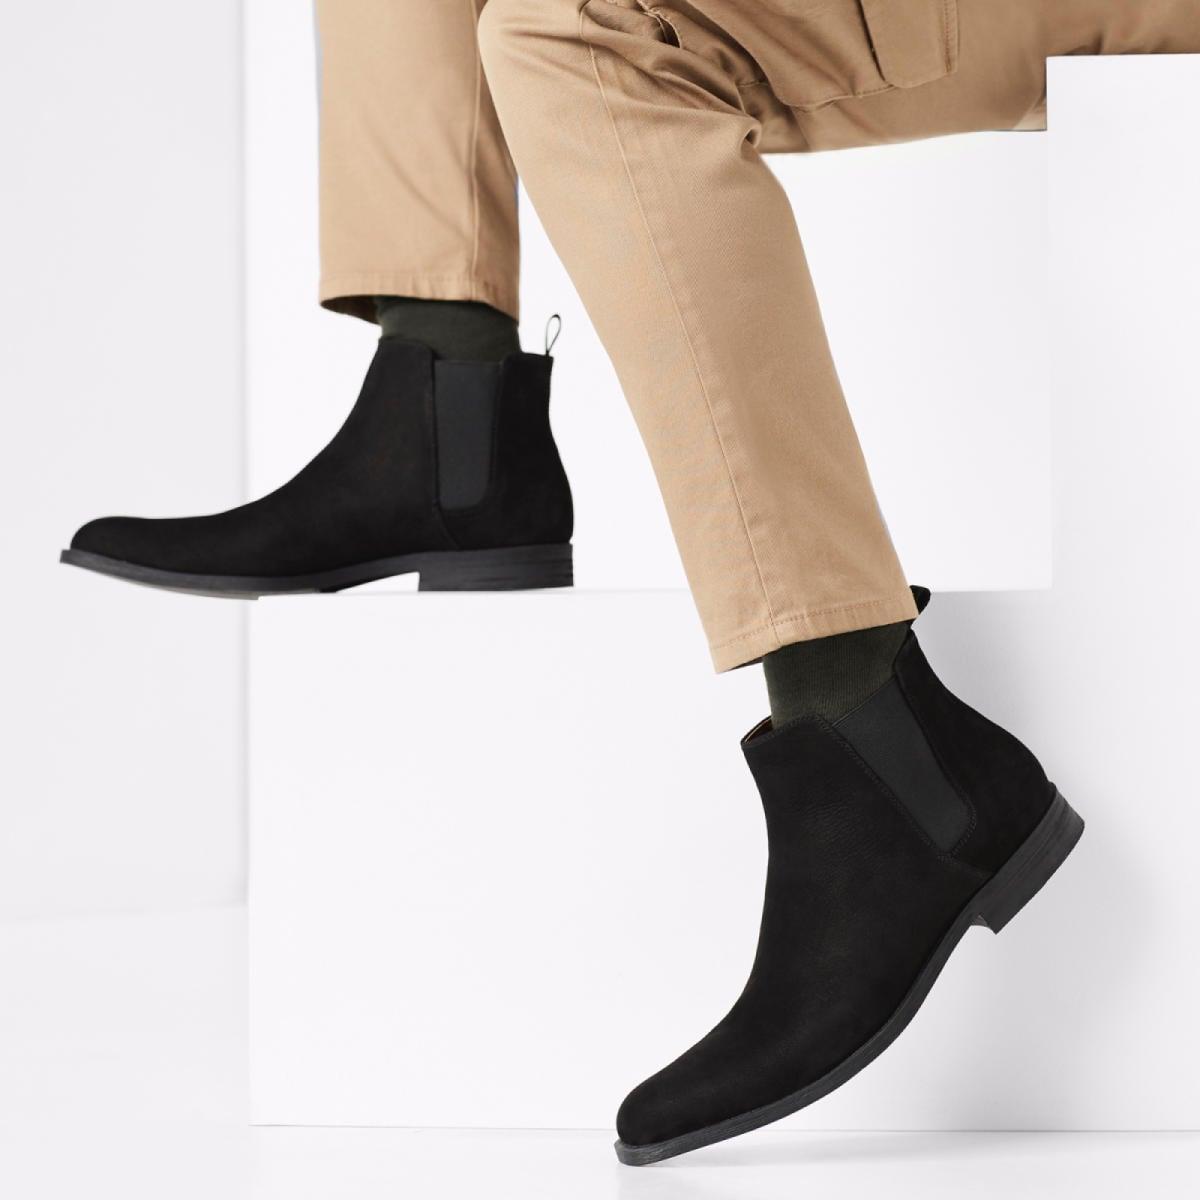 Oneilia Black Men's Chelsea Boots